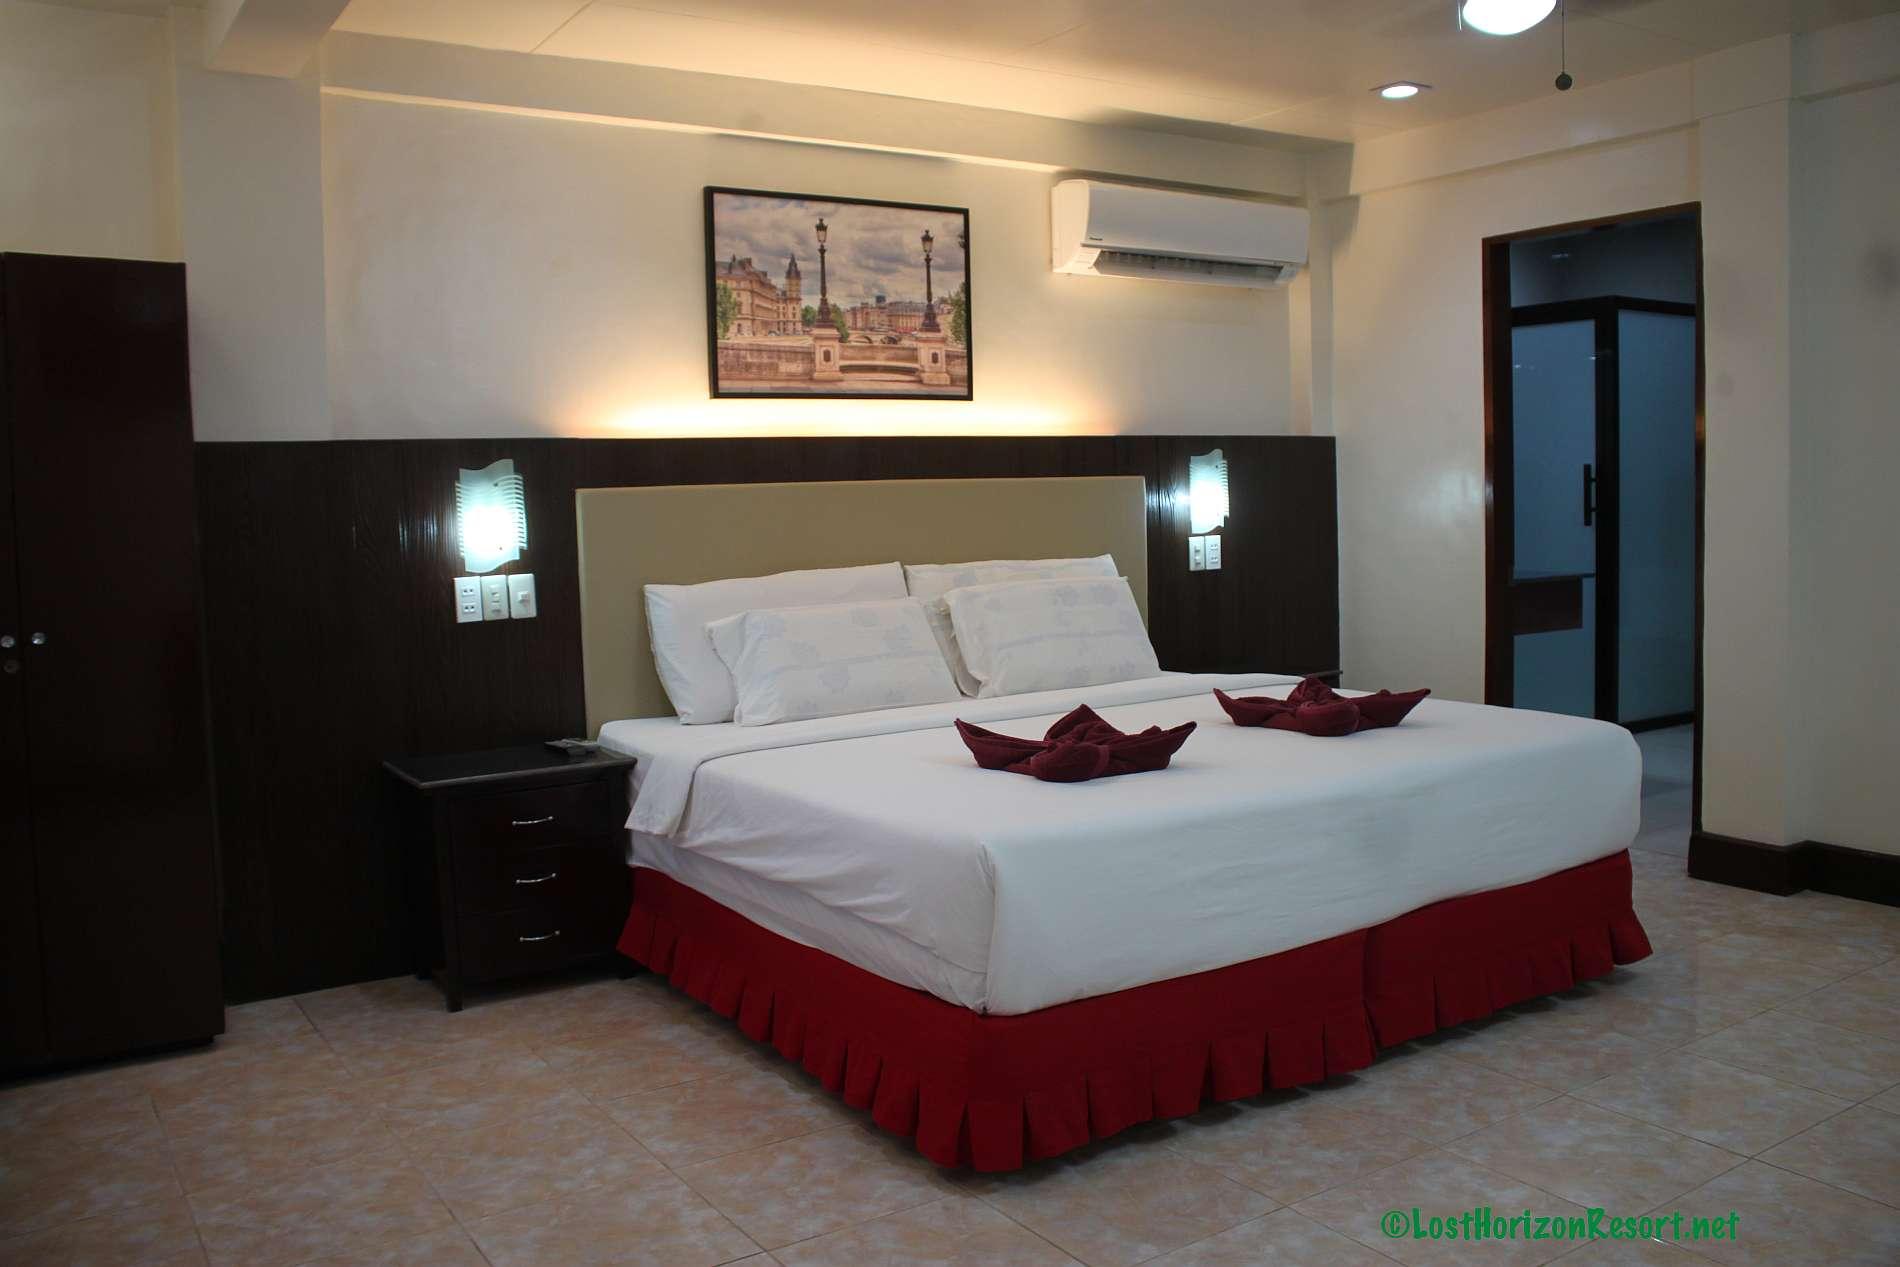 Lost-Horizon-Beach-Resort-Alona-Beach-Panglao-Bohol-Philippines-sun-view-room066